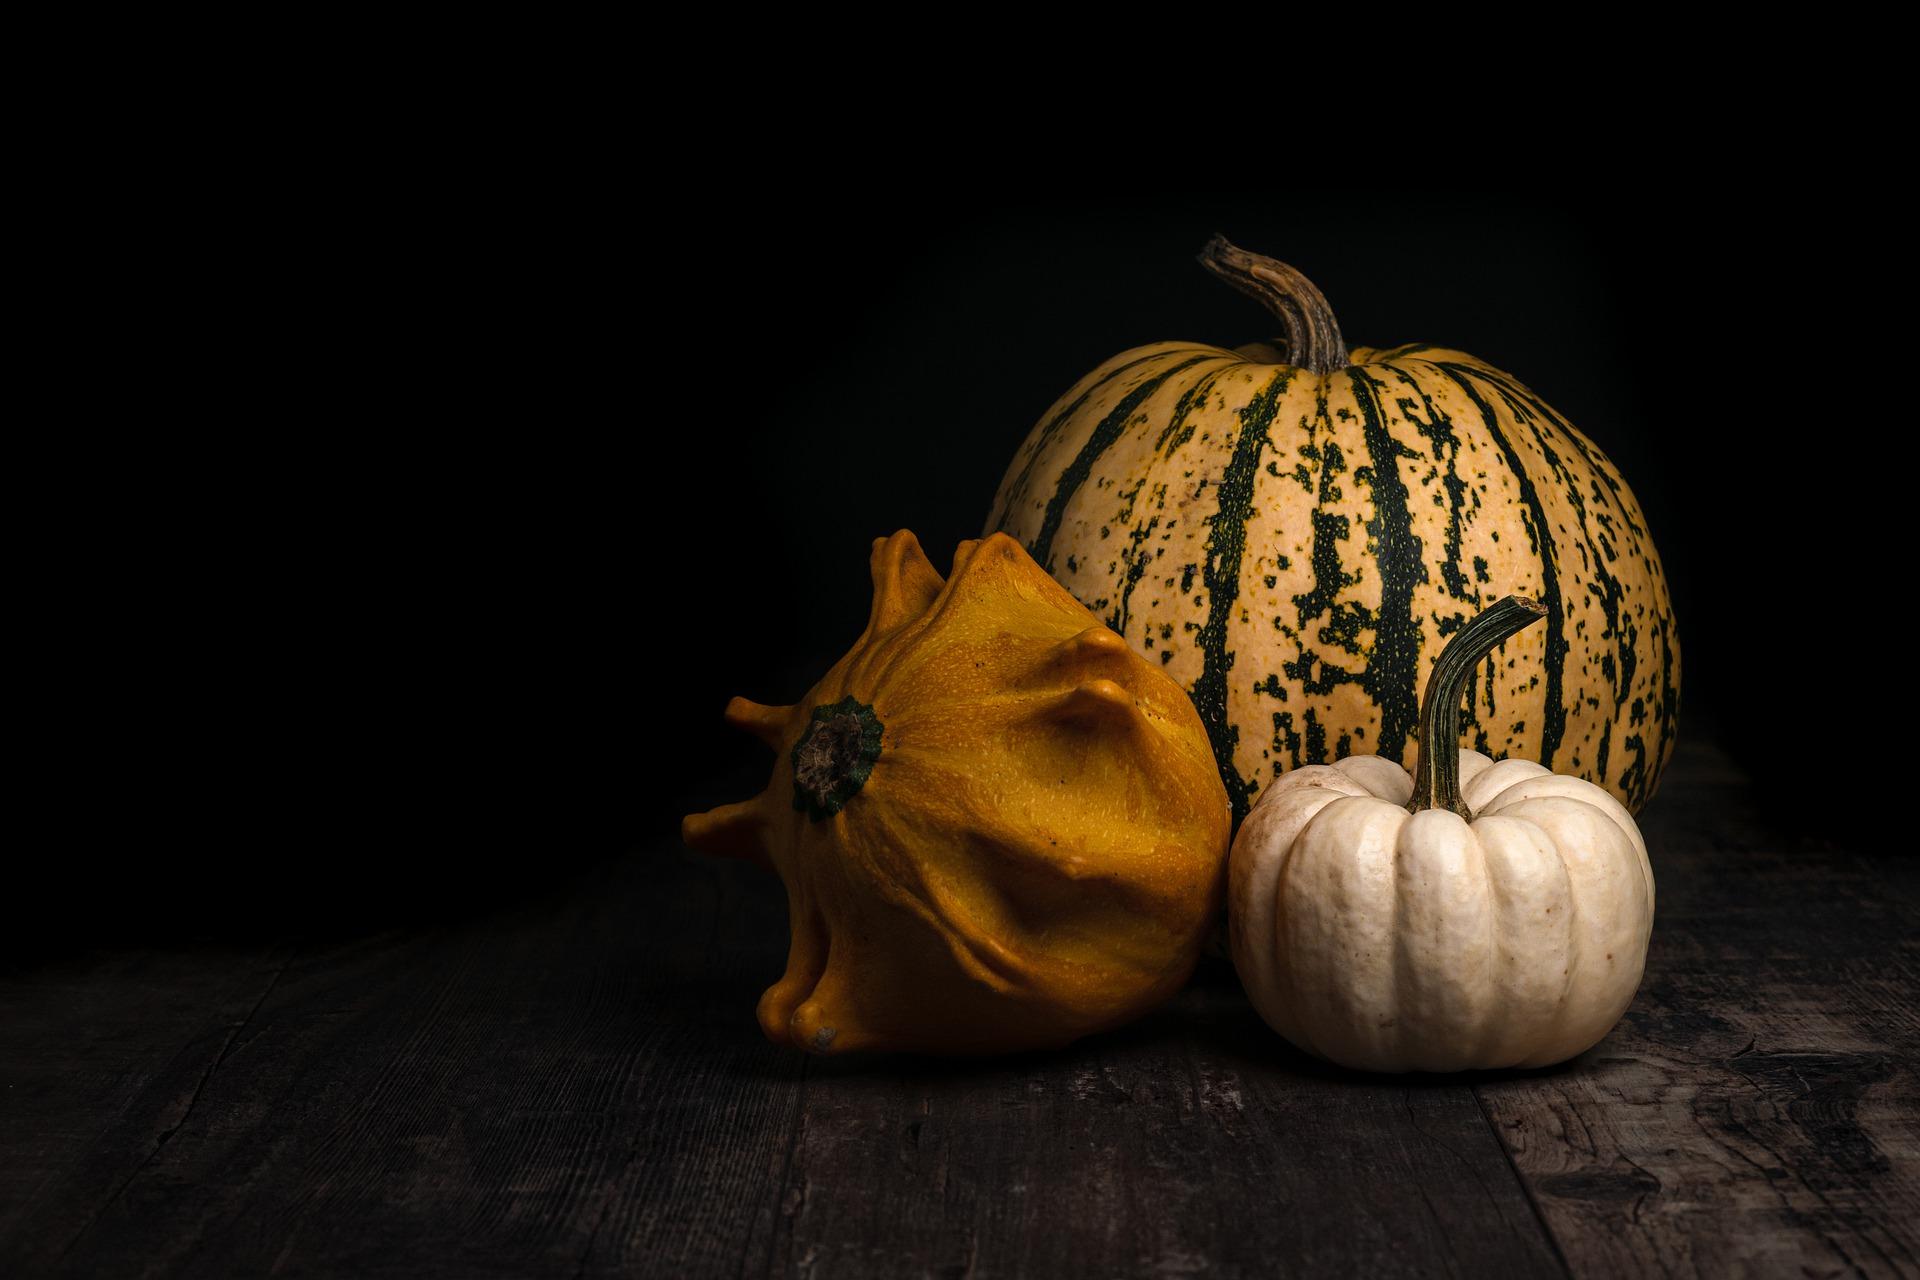 Photo of Moody Pumpkins on Black